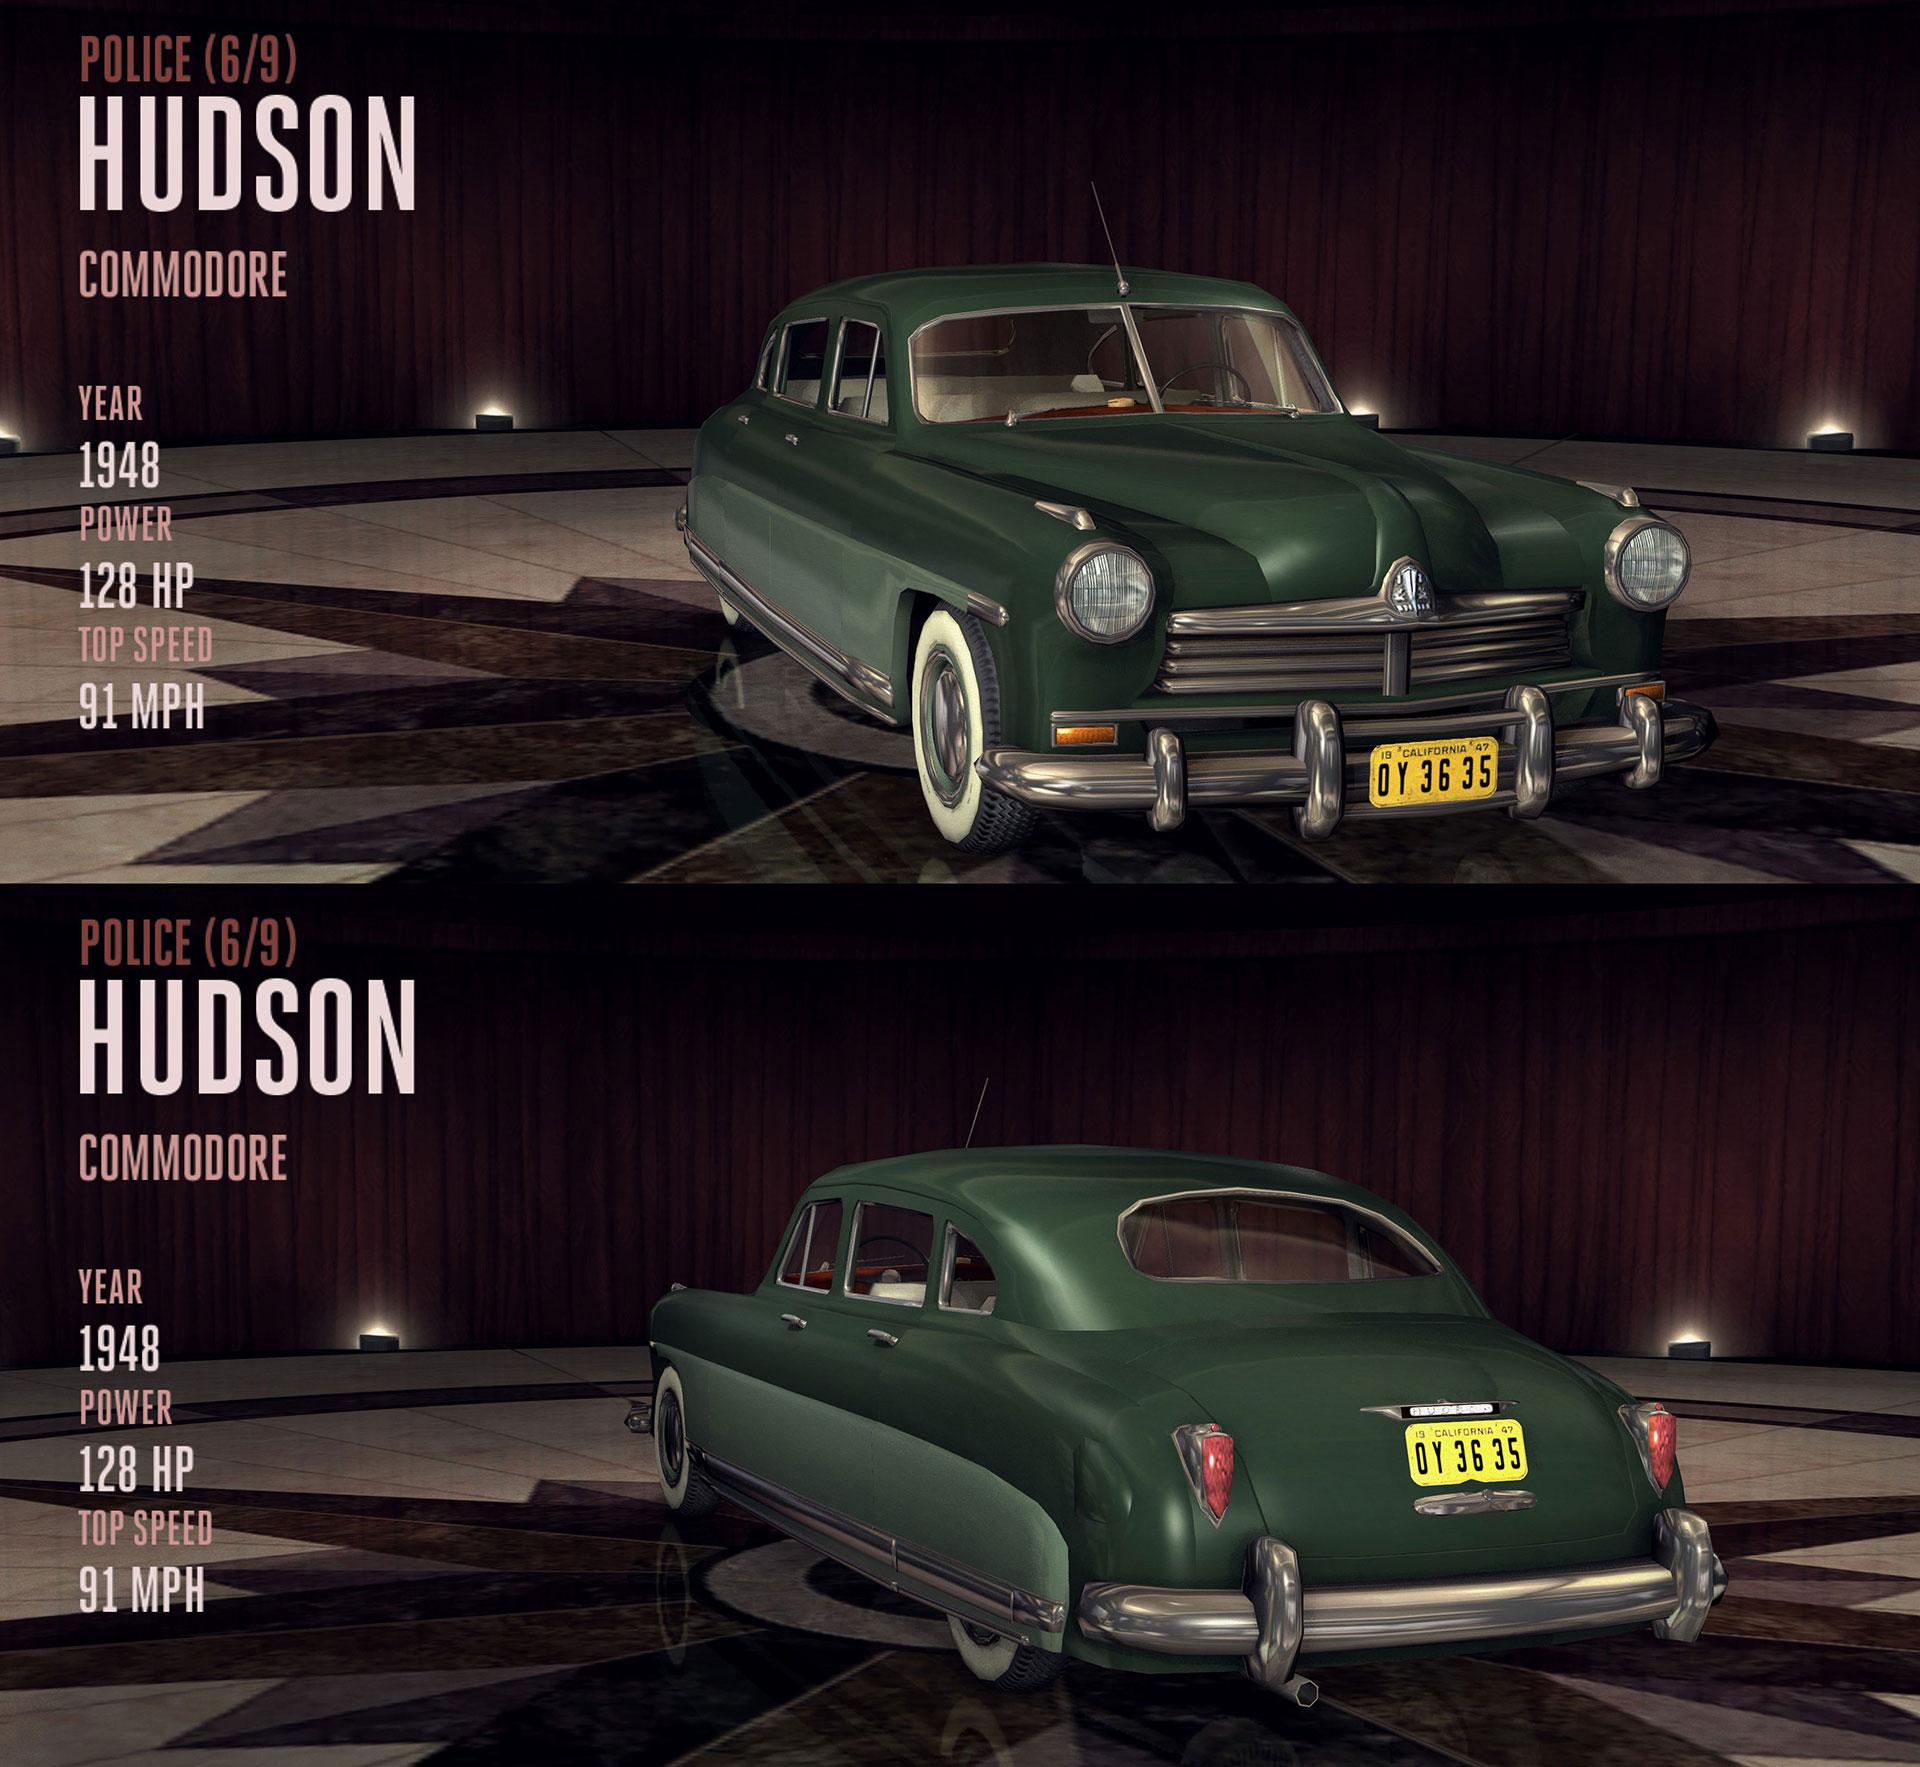 Fichier:1948-hudson-commodore.jpg